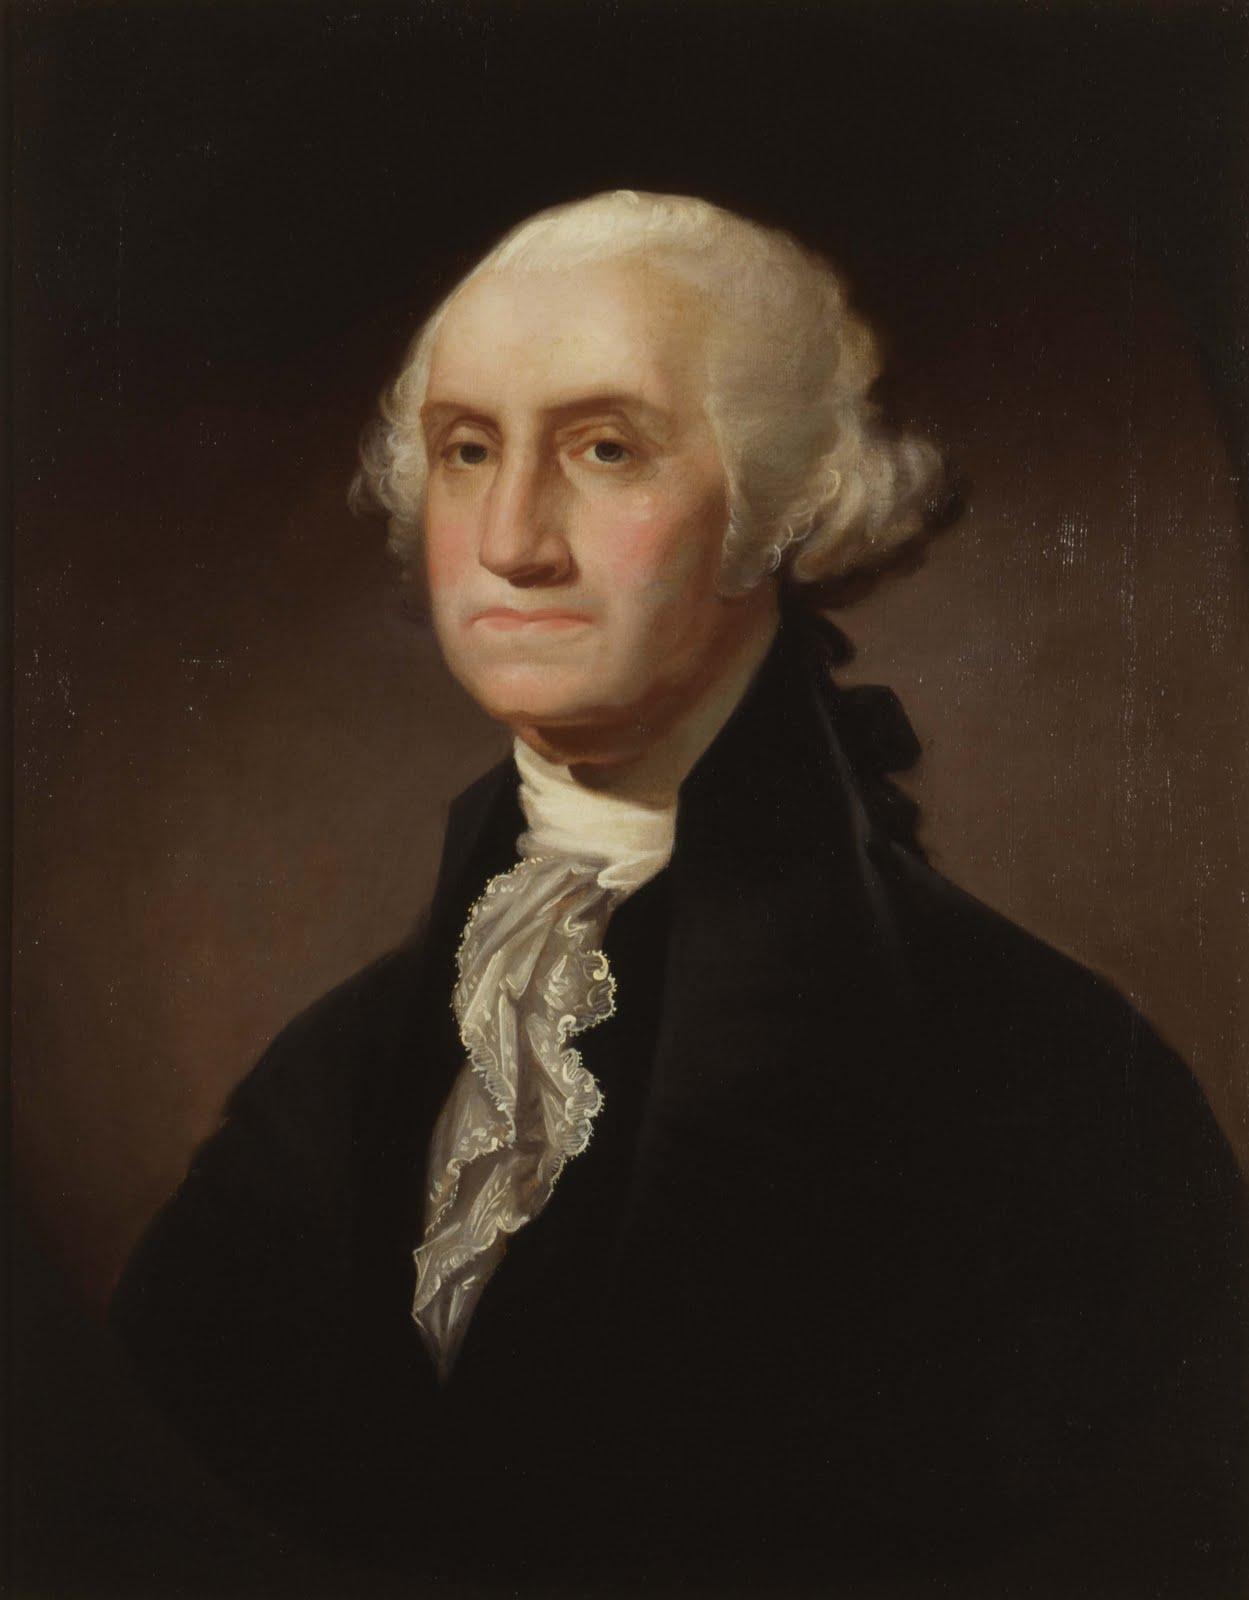 George washington exhibit headed to albany the new york history blog